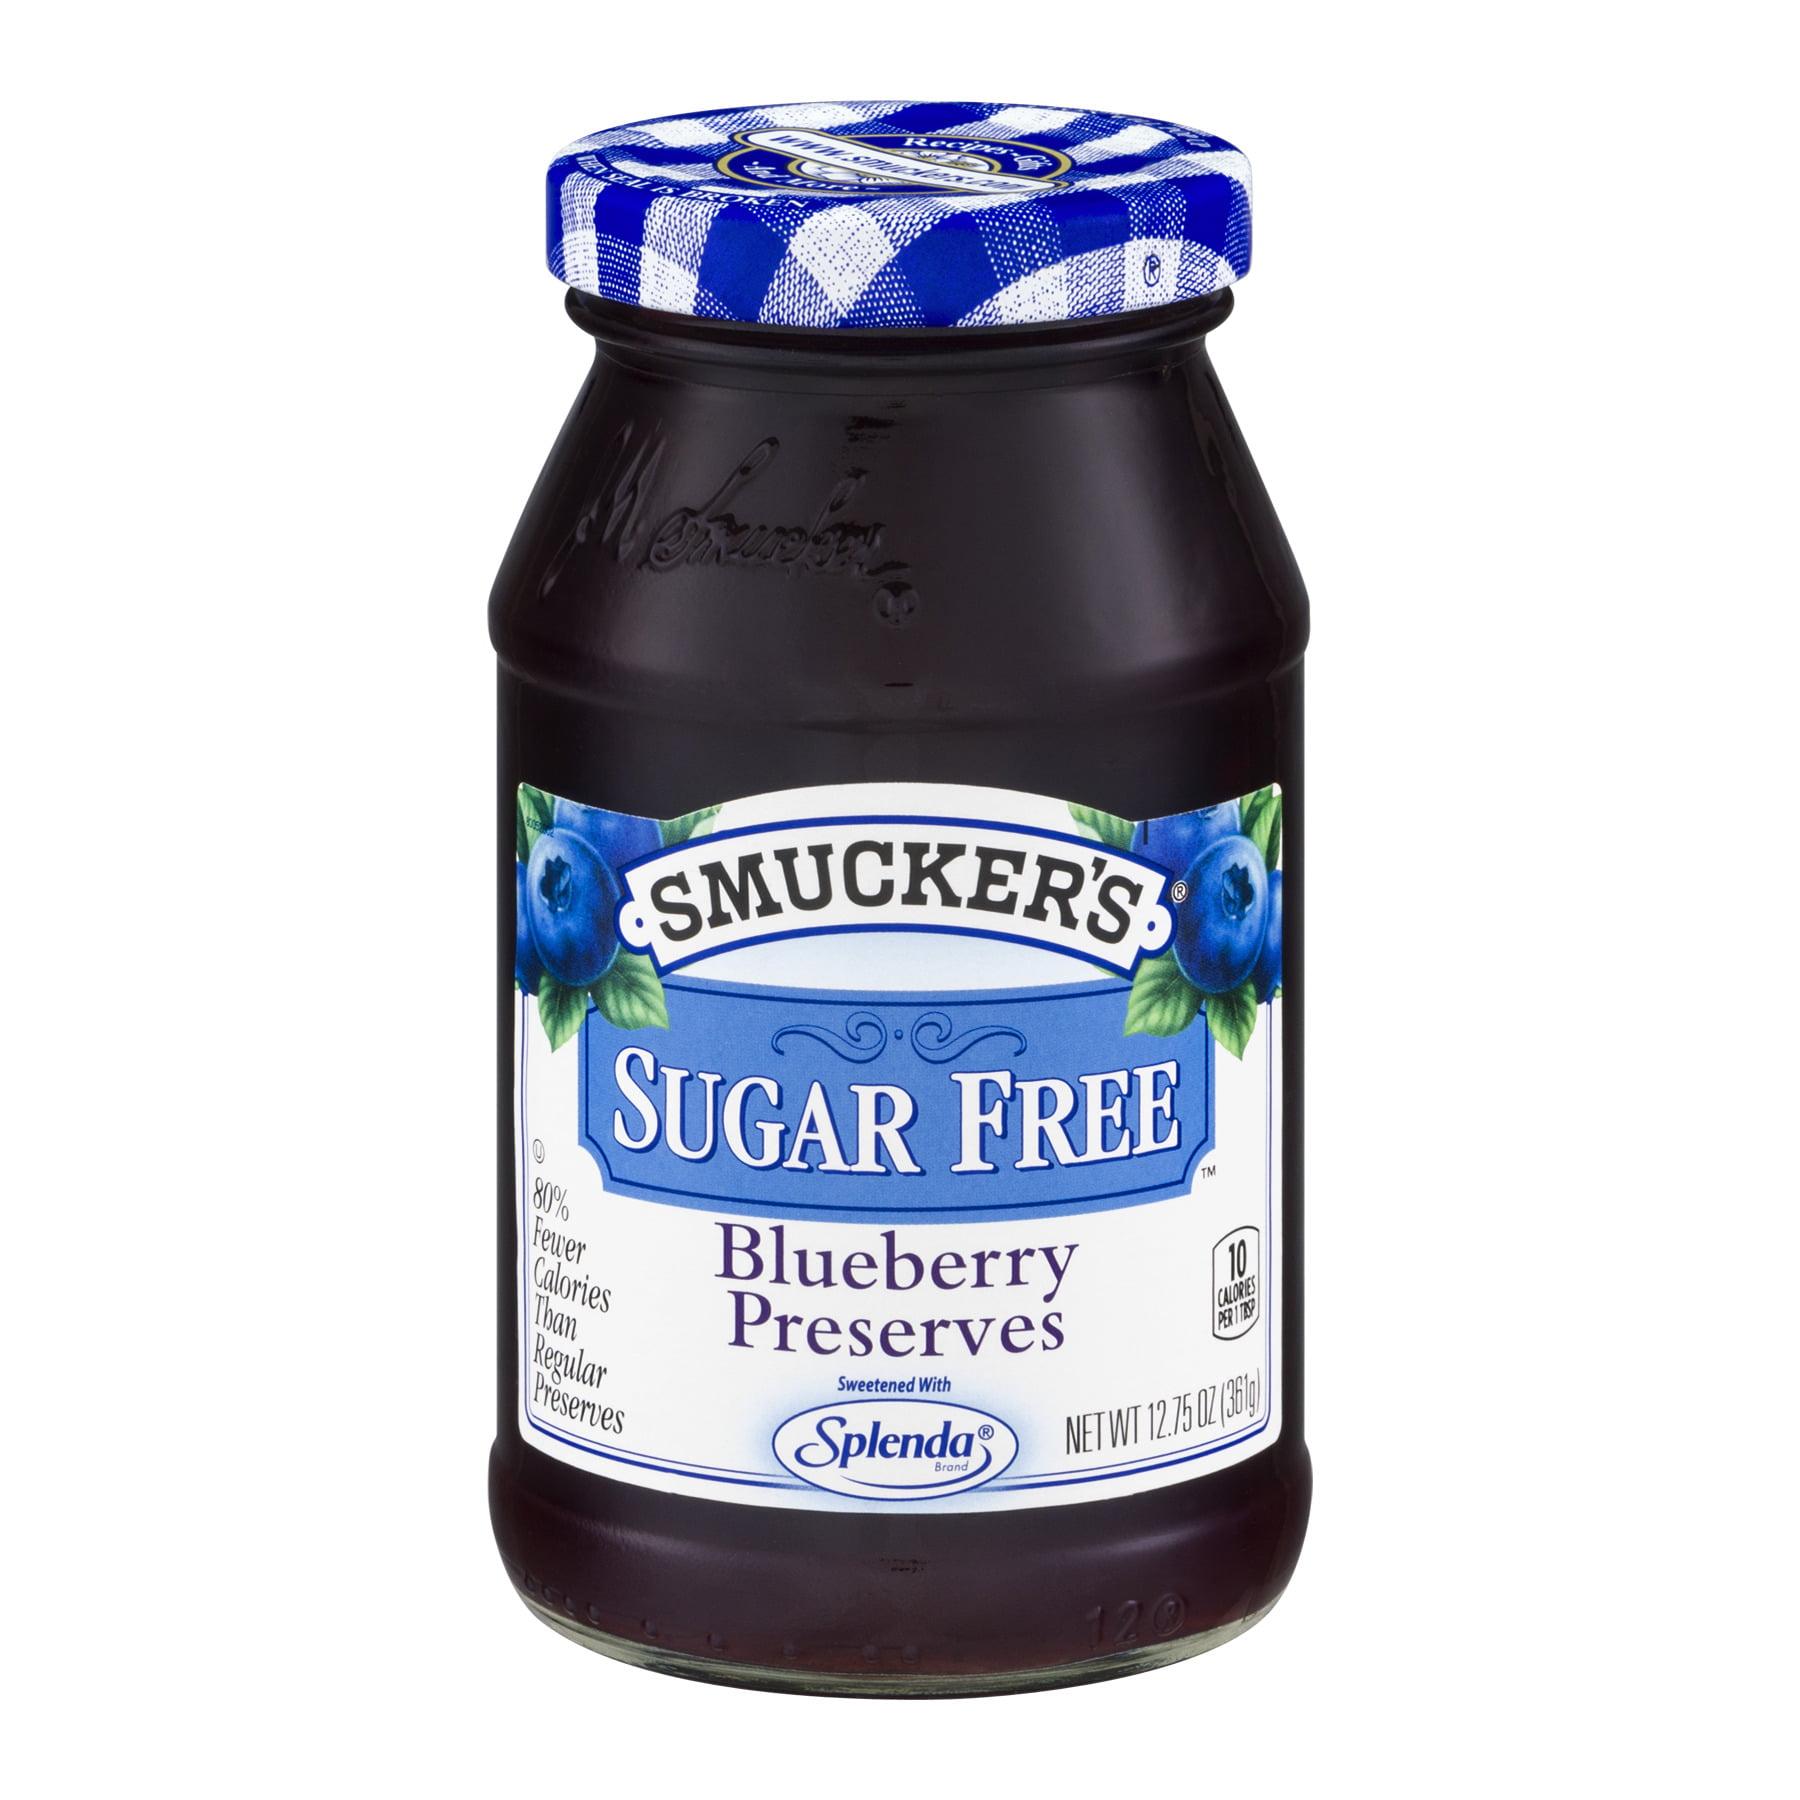 Smucker's: Blueberry Sugar Free Preserves, 12.75 oz